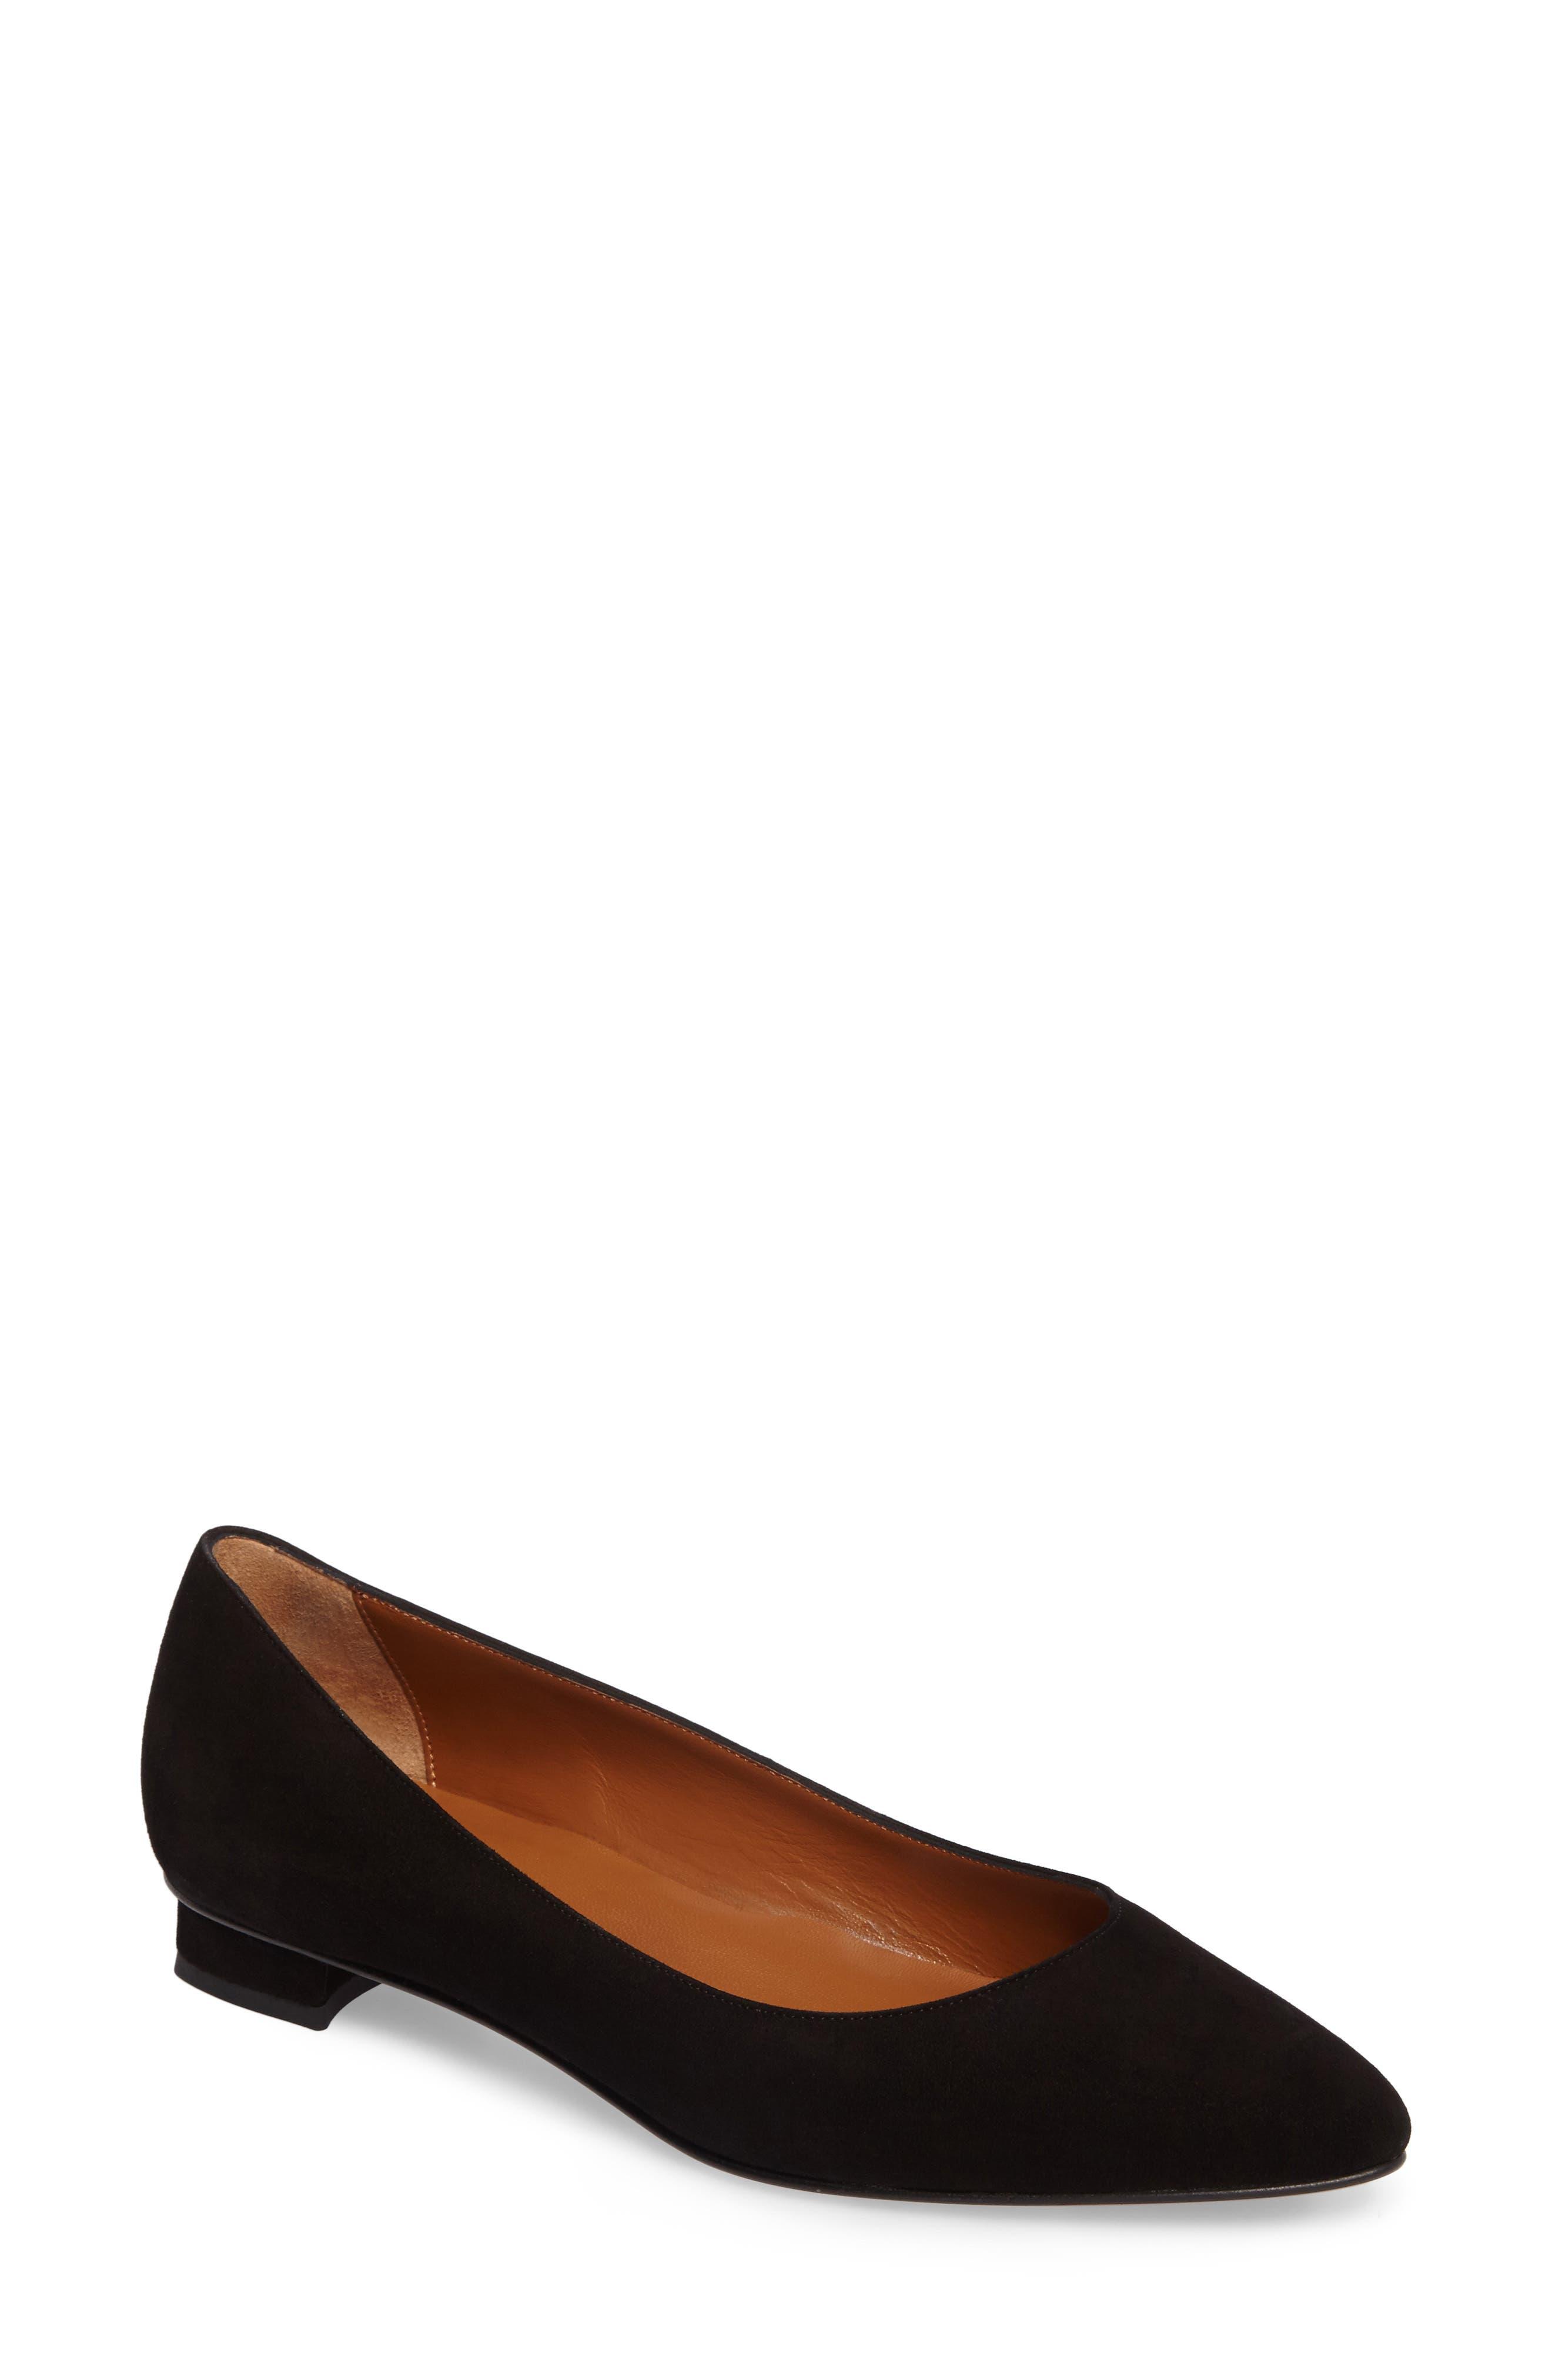 Perla Weatherproof Ballerina Shoe,                         Main,                         color, 001